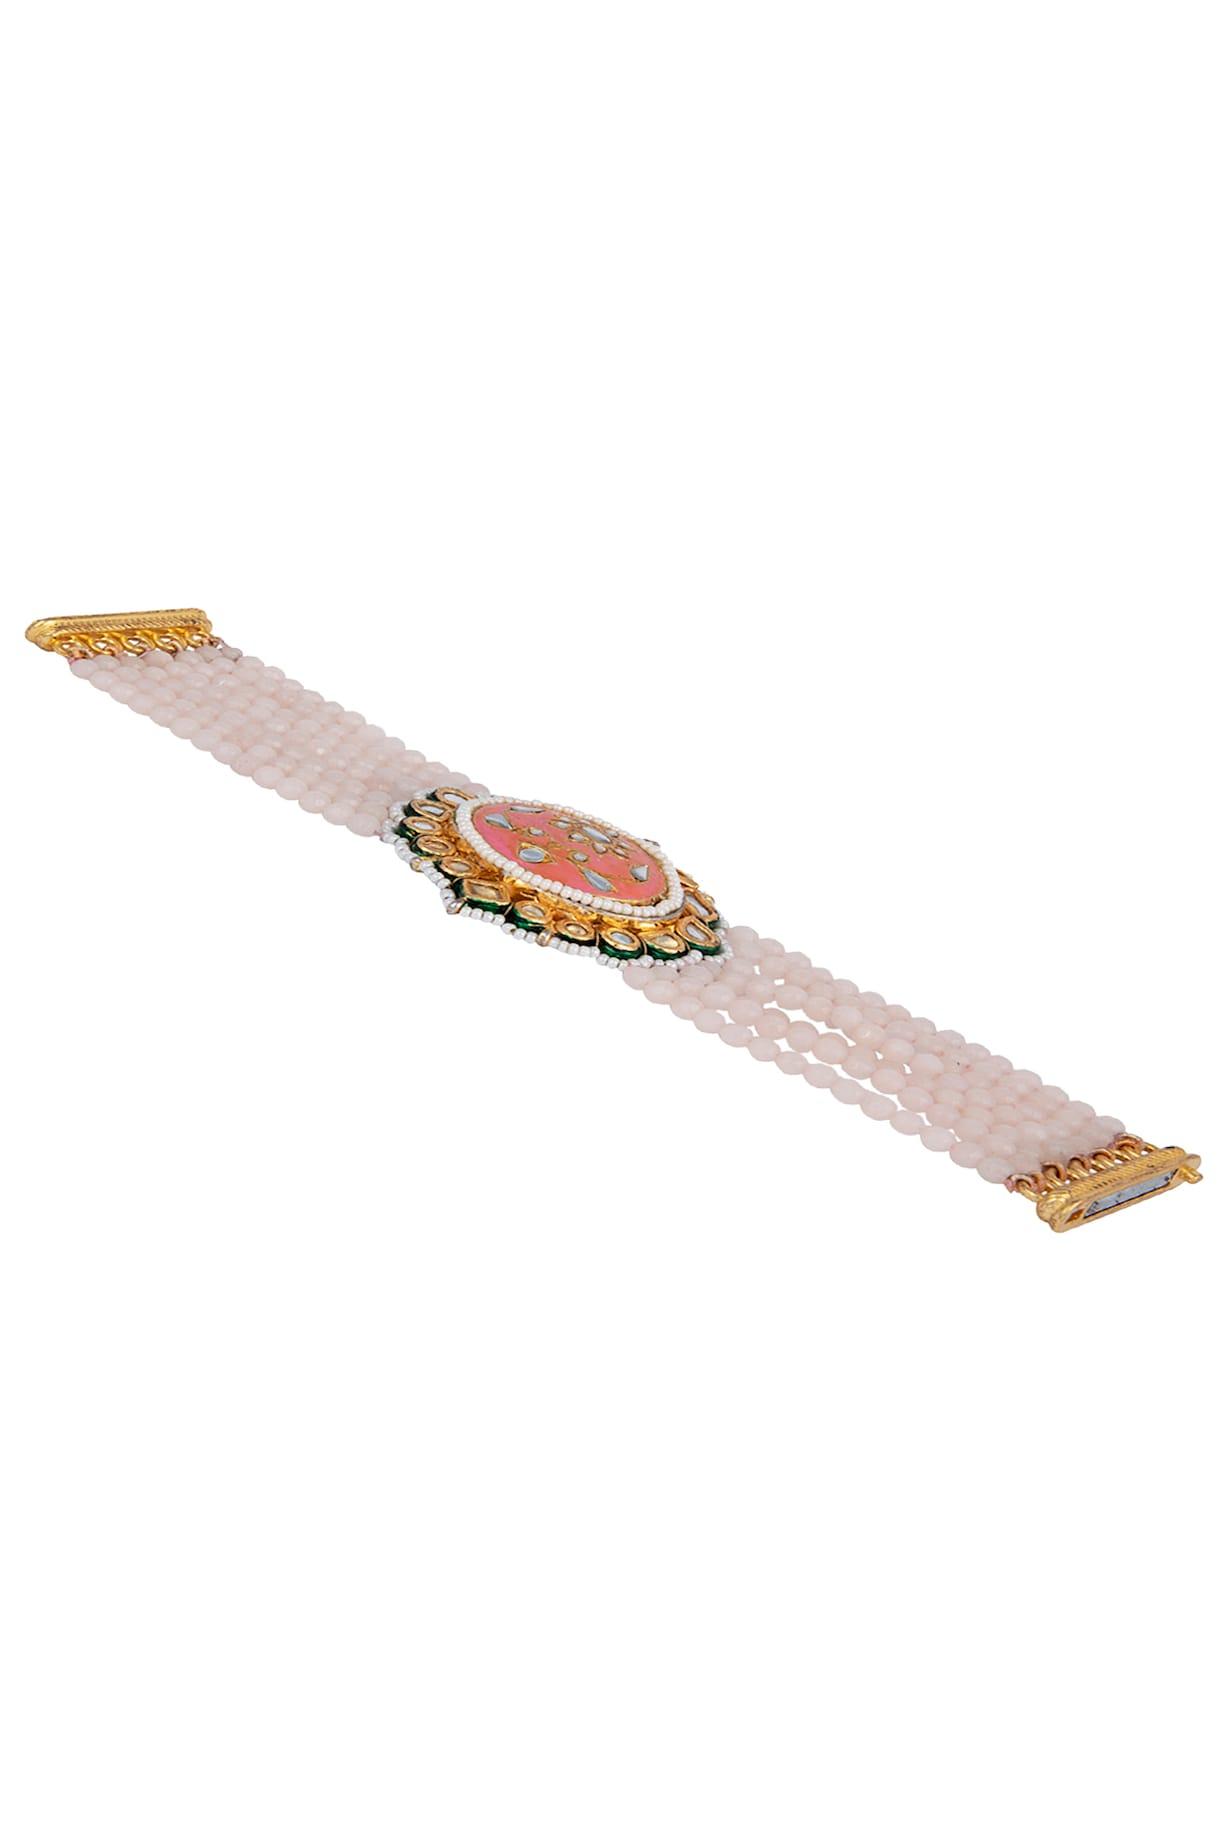 Just Jewellery Bracelets